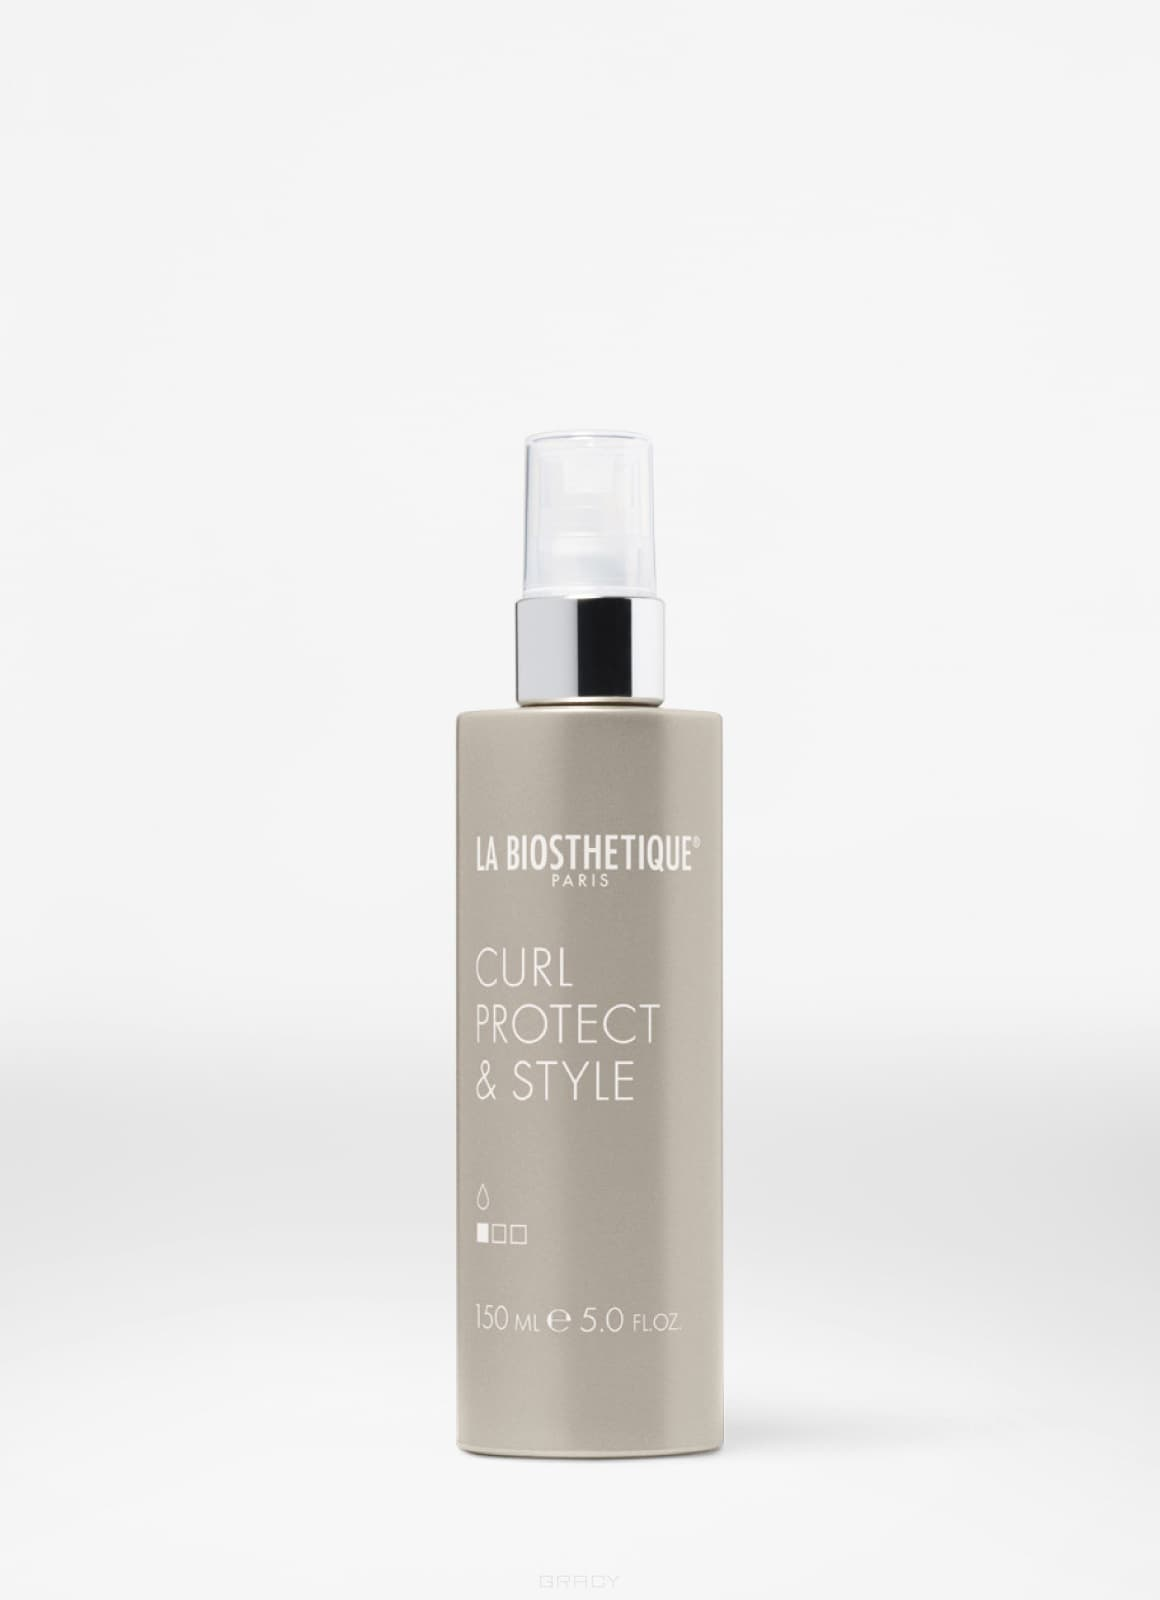 La Biosthetique - Термоактивный спрей для укладки и защиты кудрей Style Curl Protect  Style, 150 мл